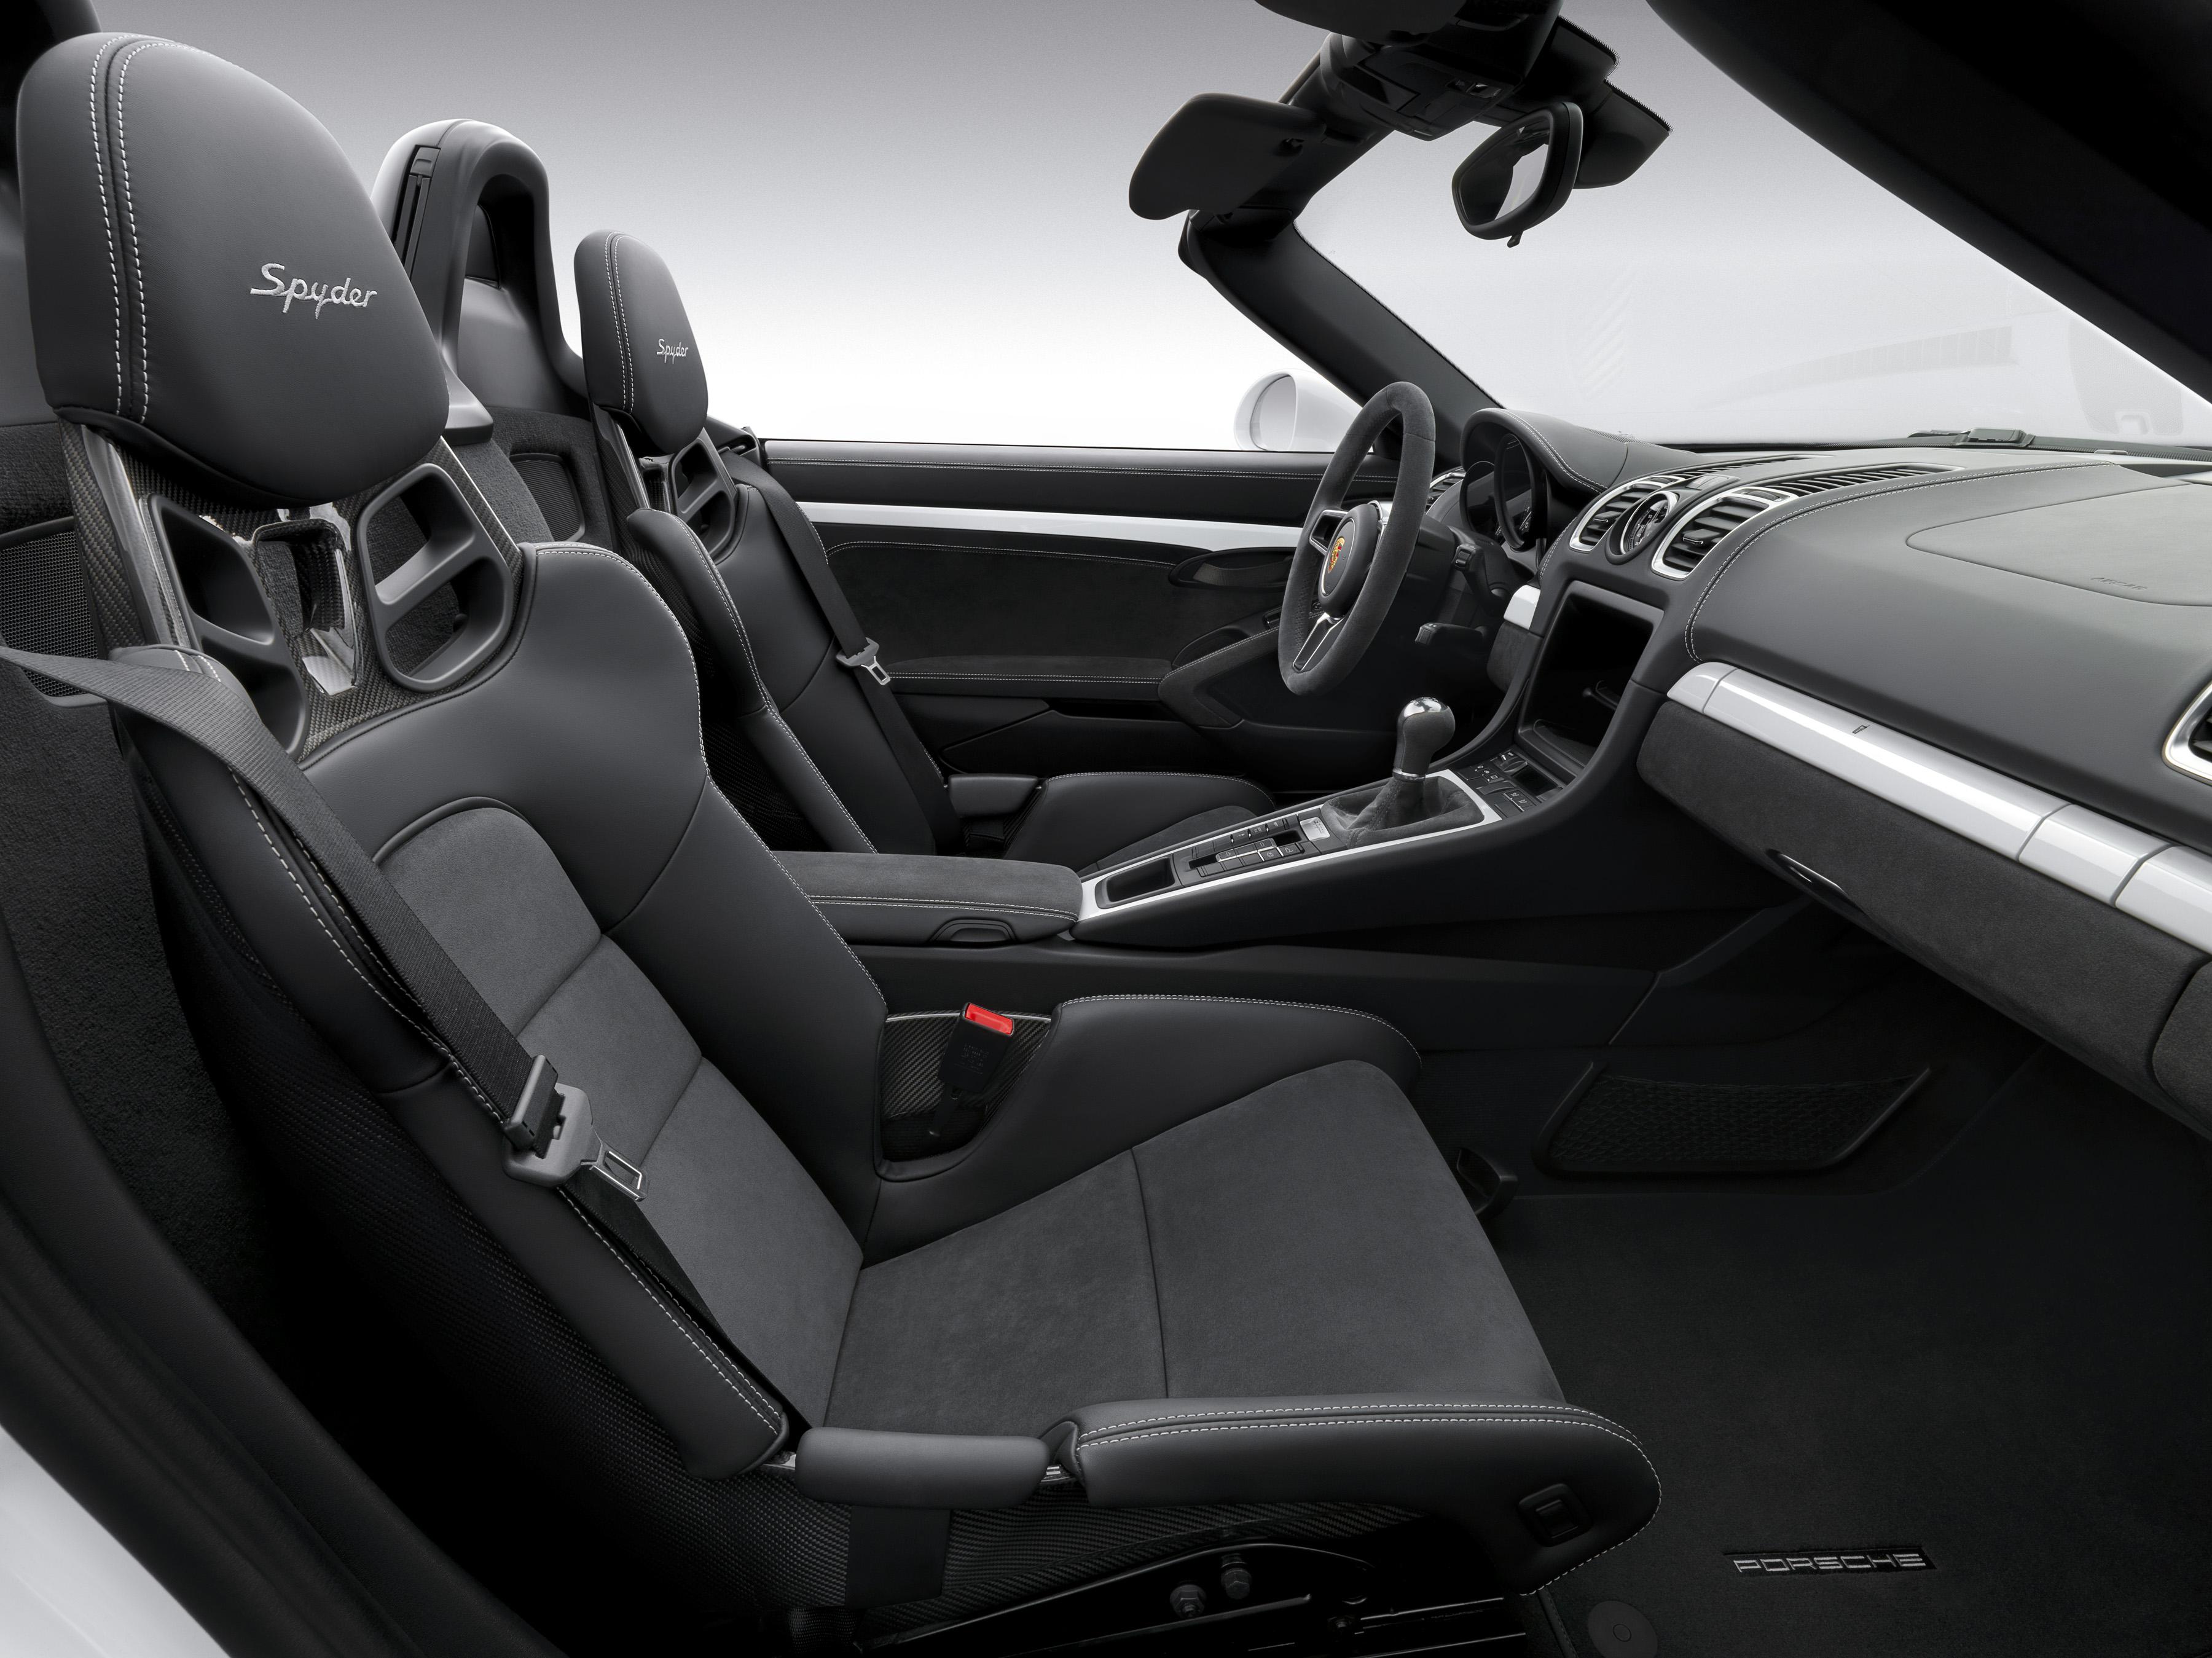 Porsche 2016 Boxster Spyder - intérieur / interior